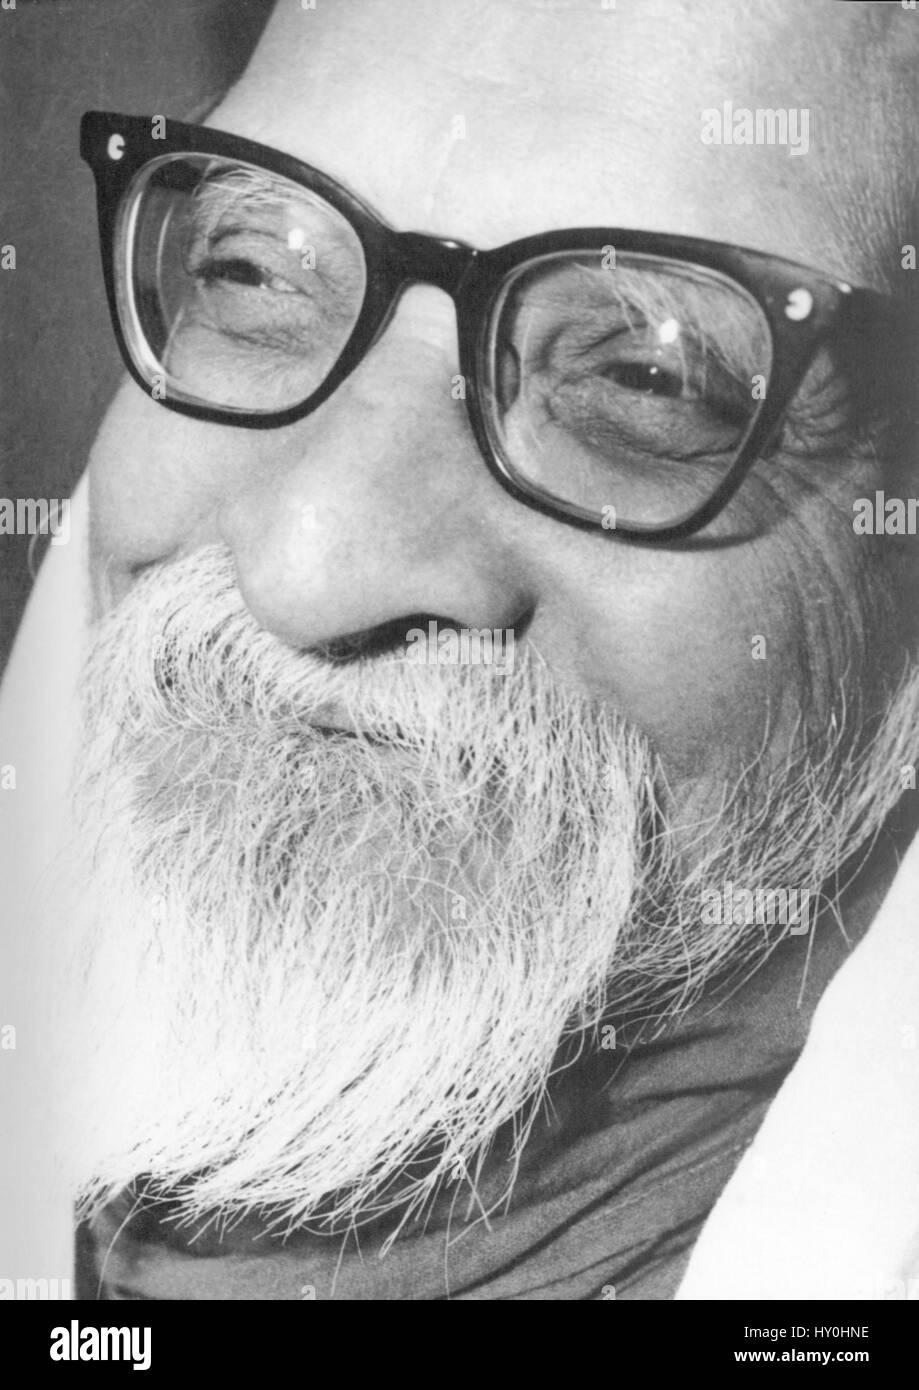 Indian advocate of nonviolence Vinoba Bhave India Asia 1957 - Stock Image